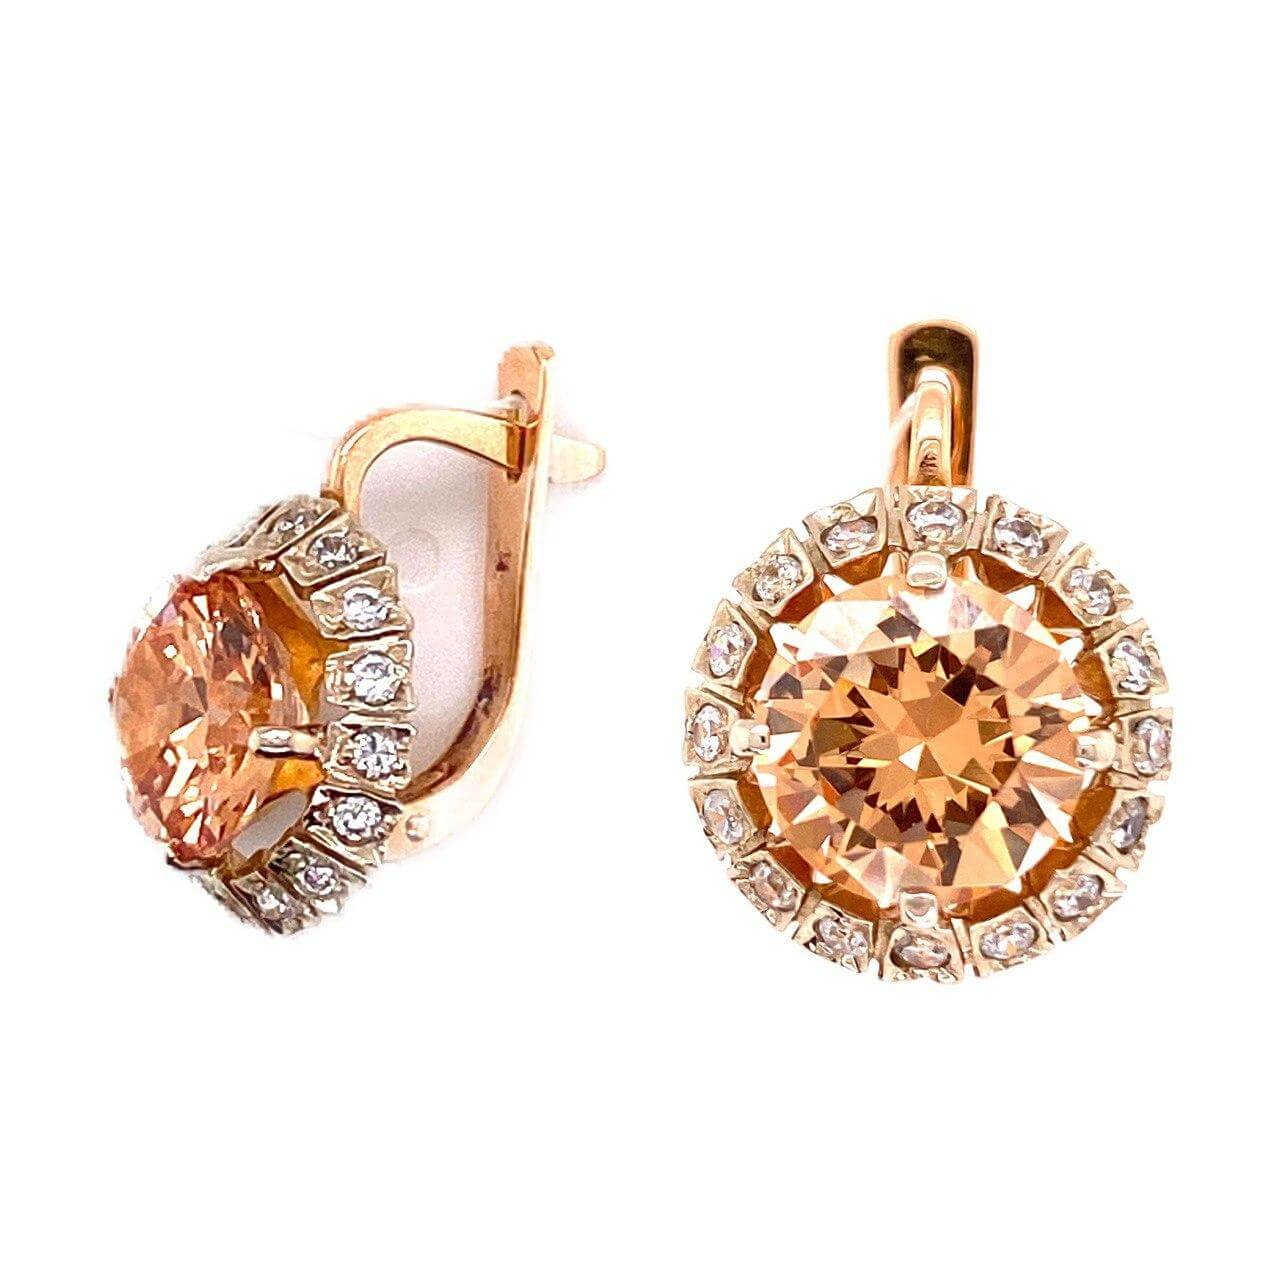 Золотые серьги с цирконием арт. 0222желтый 0222желтый